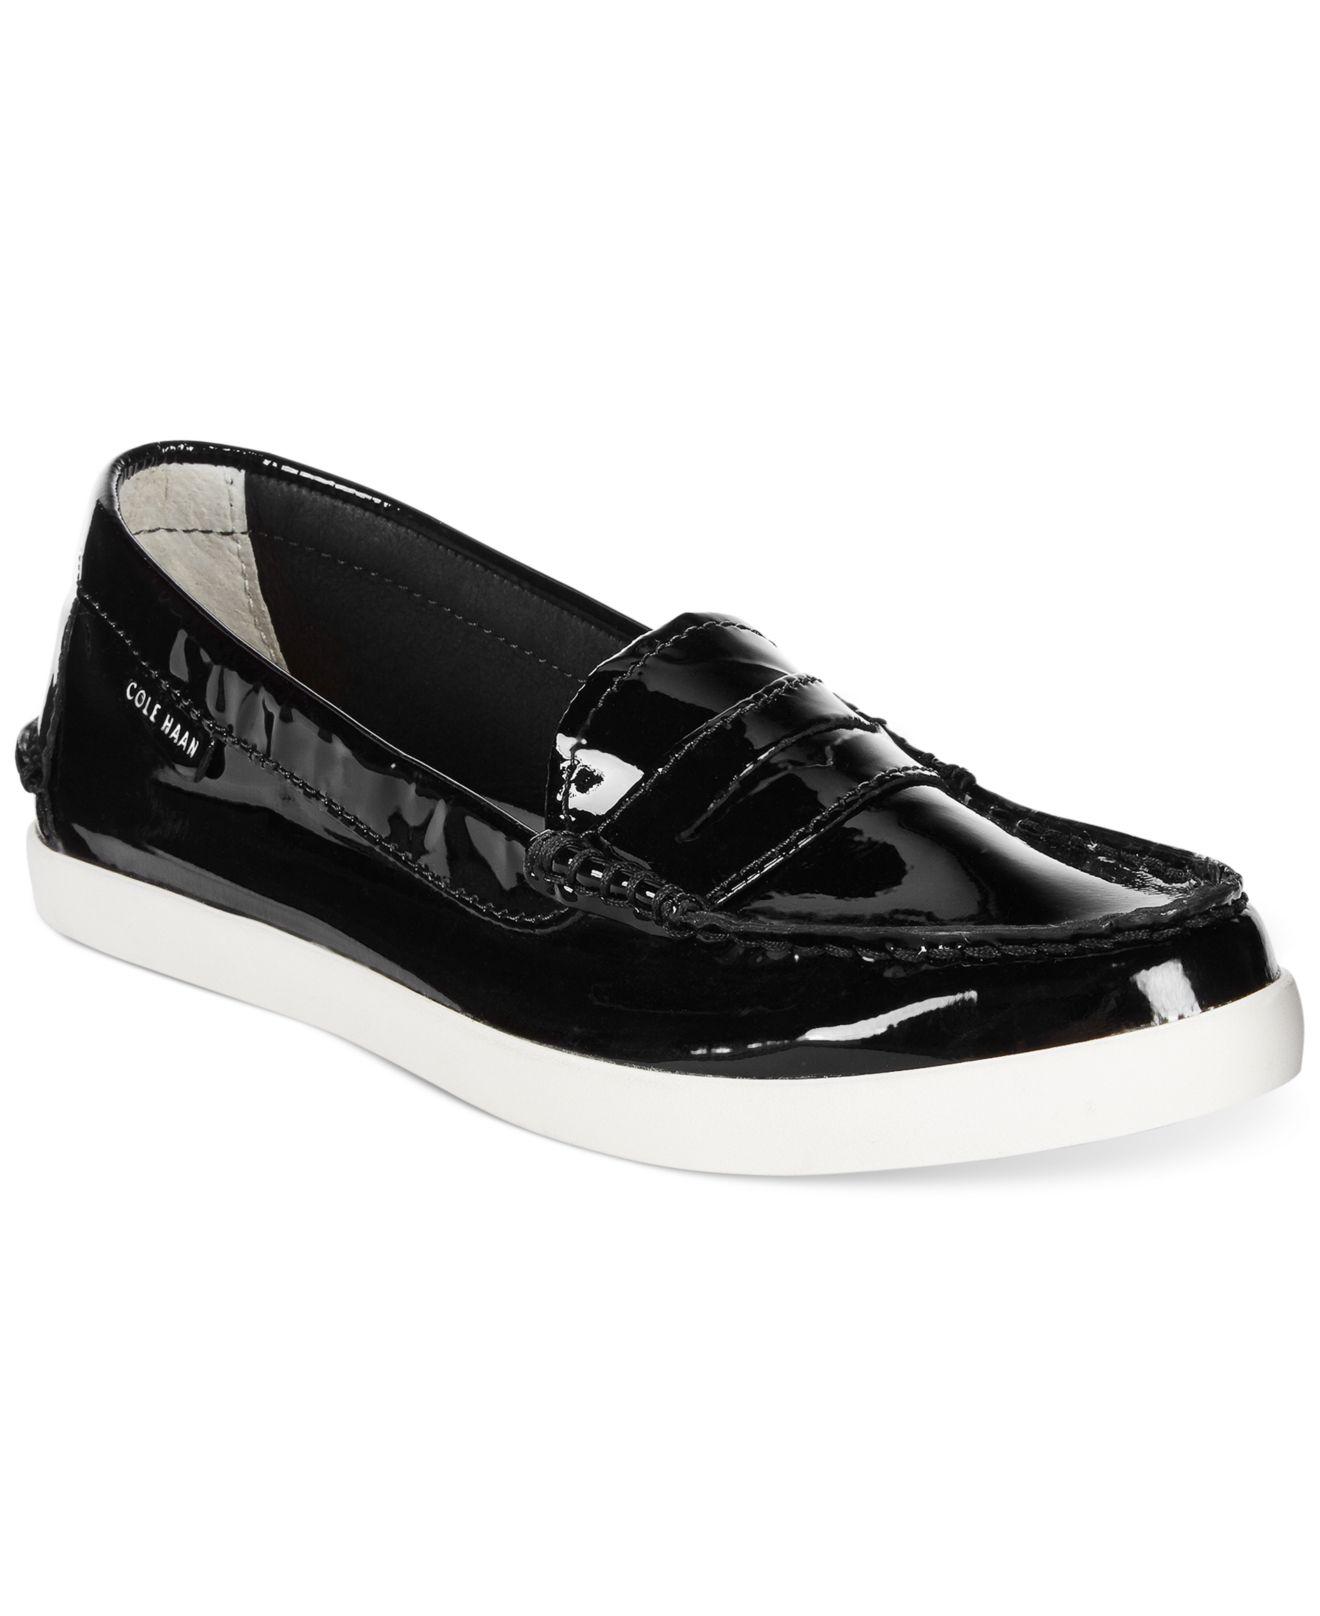 aa697123739 Lyst - Cole Haan Pinch Weekender Loafers in Black